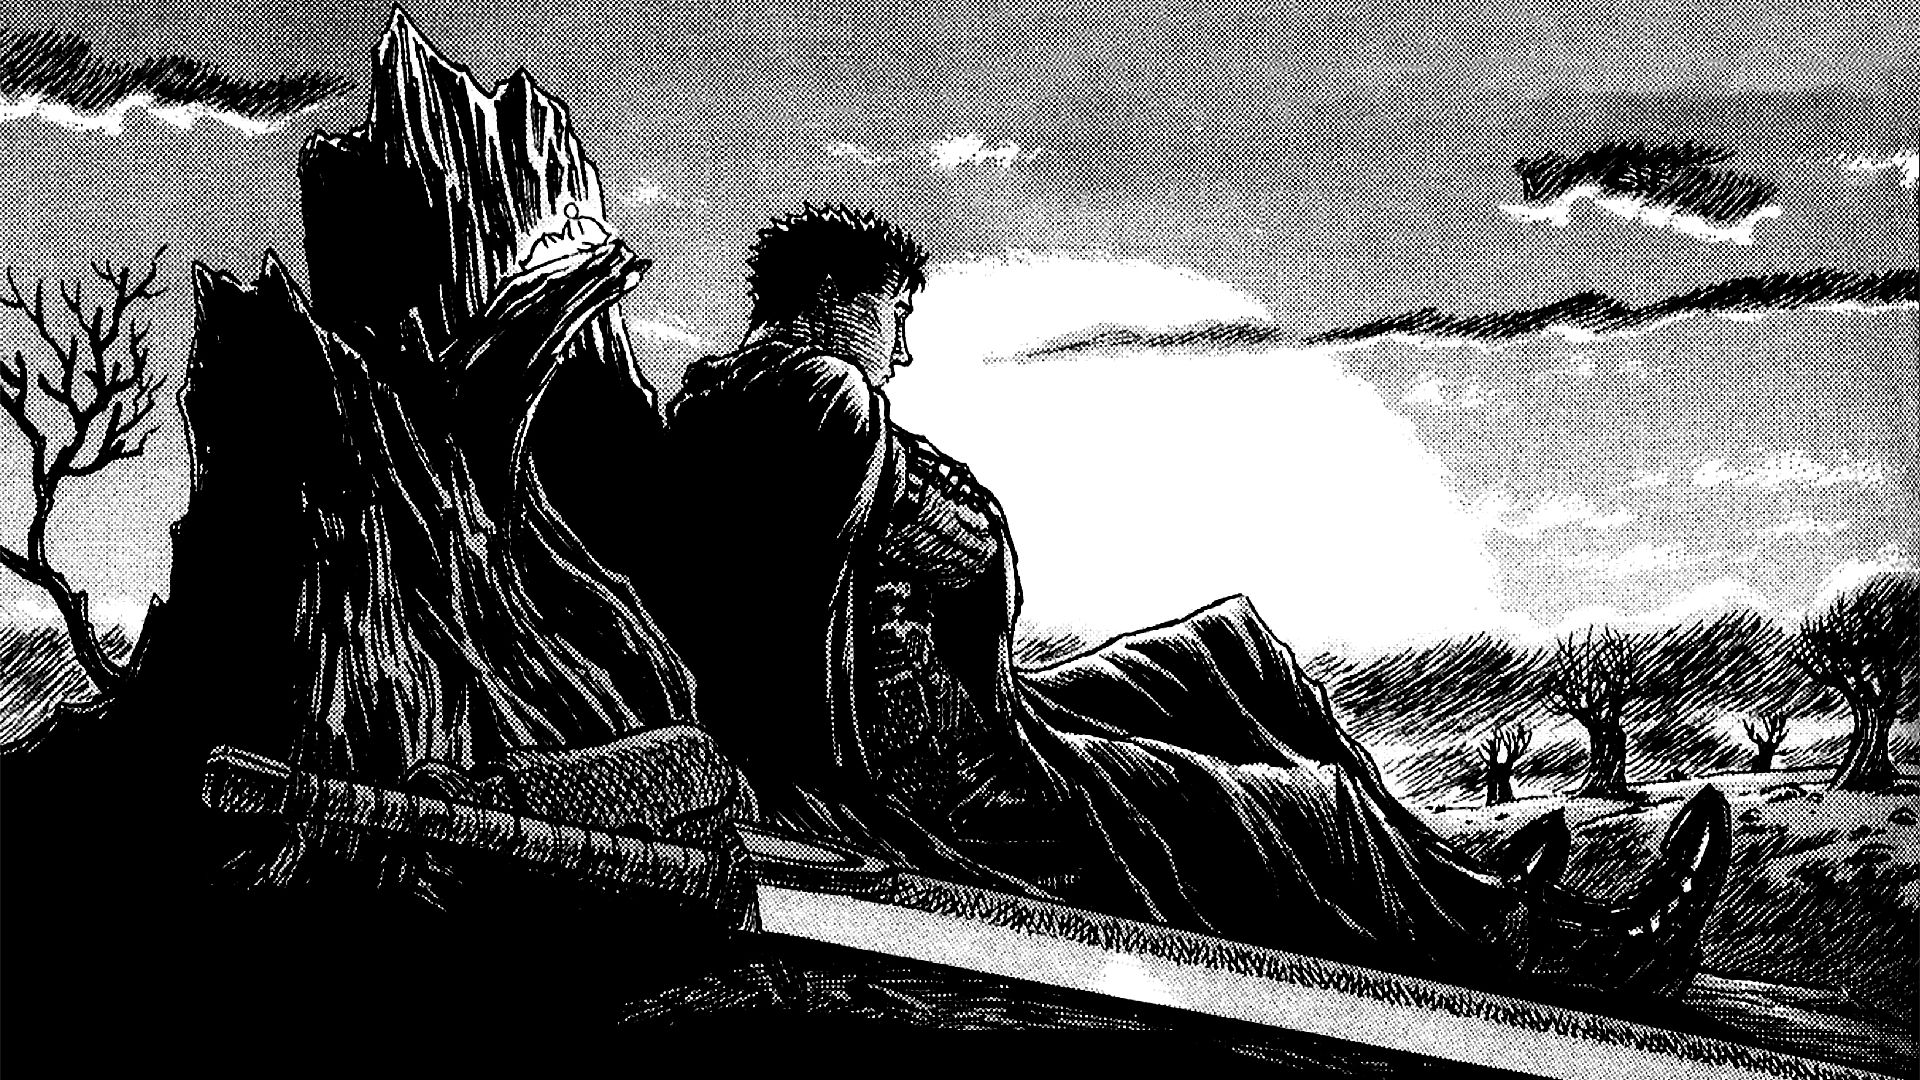 Anime Berserk Wallpaper Ilustração de mangás